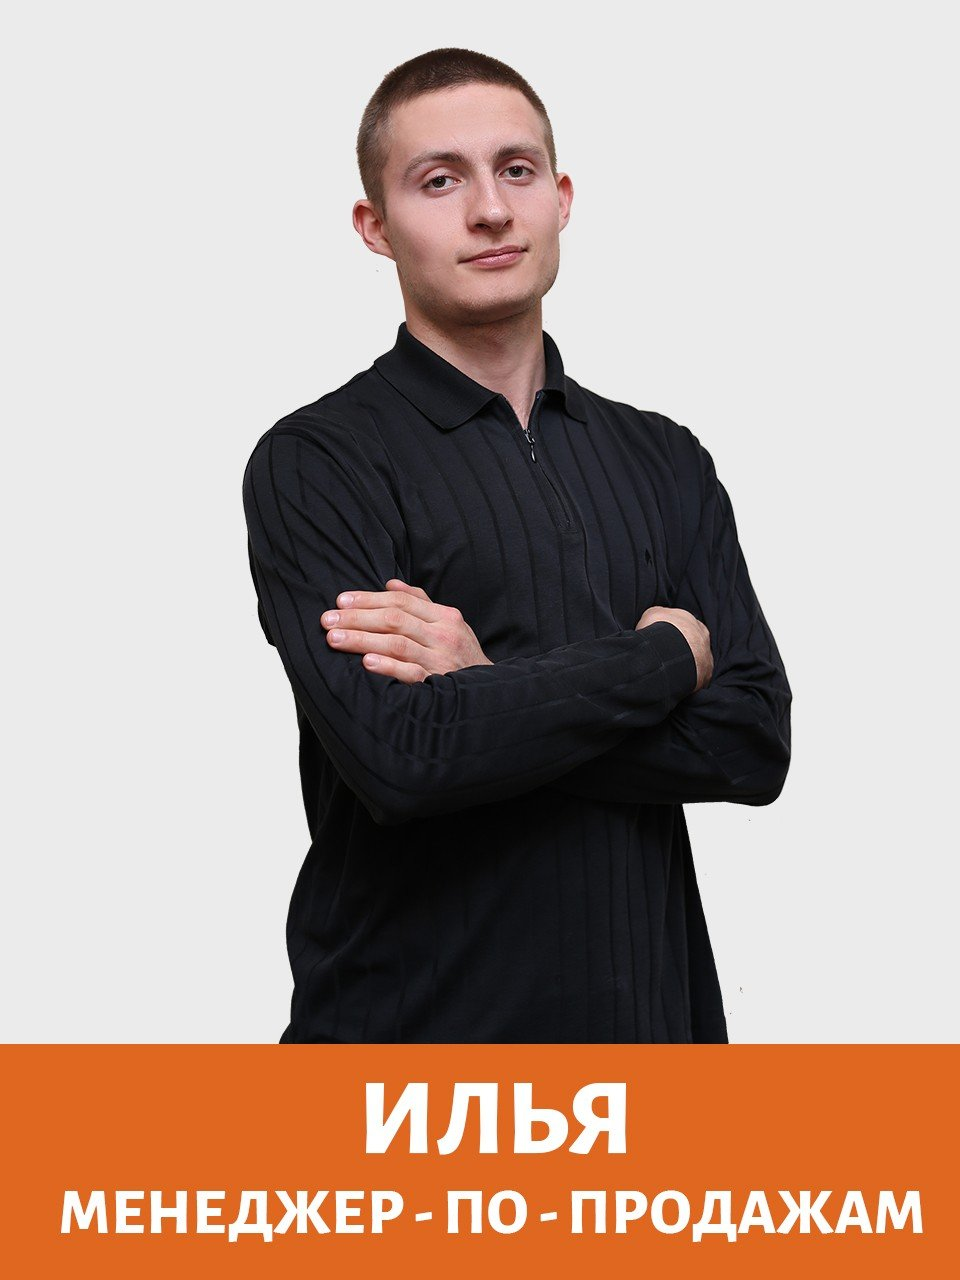 ilja menedzher po prodazham - Сделать сайт